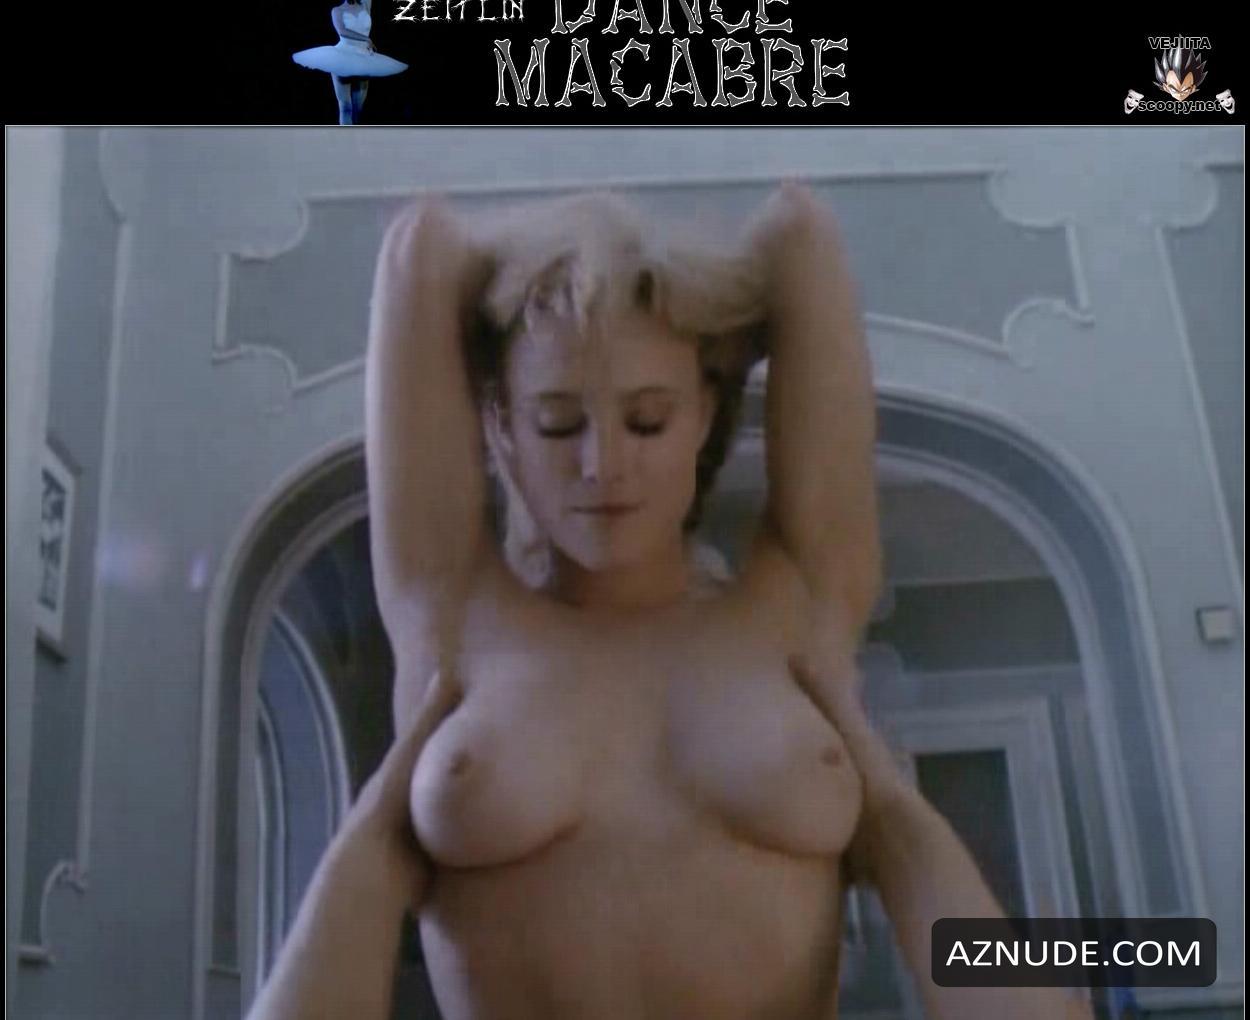 Angelina jolie michelle williams sarah silverman nude hd 8